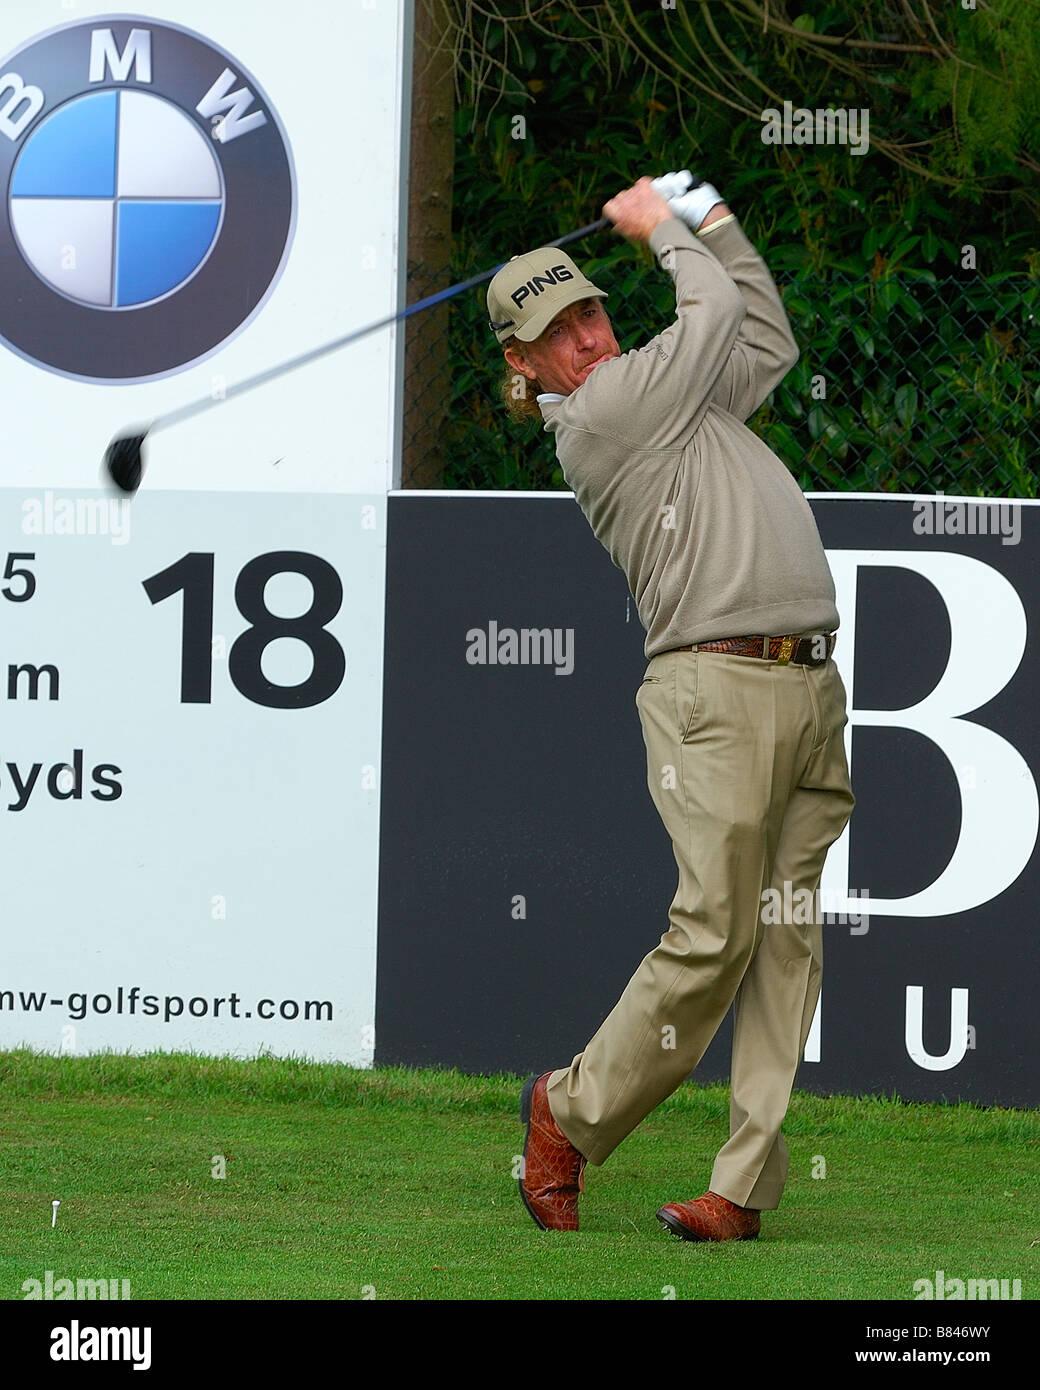 Miguel Angel JIMÉNEZ at the BMW PGA Championships Wentworth 2008 - Stock Image